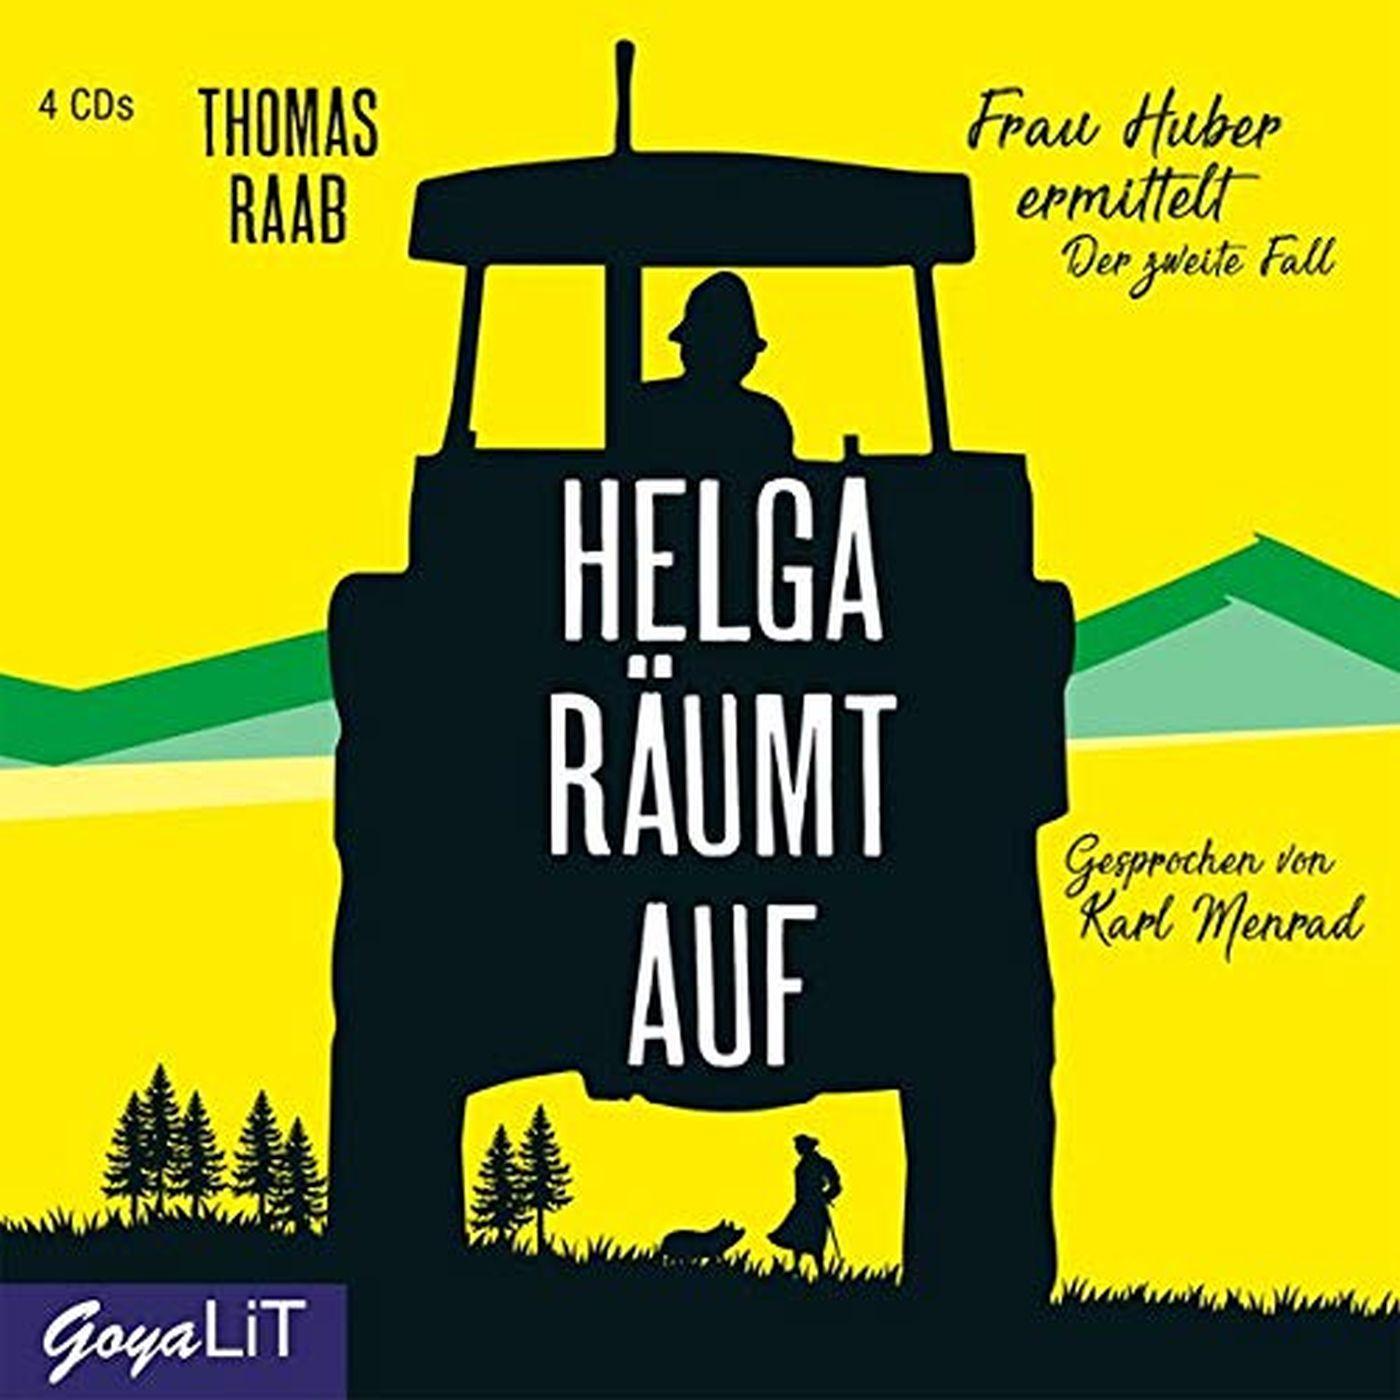 Thomas Raab - Helga räumt auf. Frau Huber ermittelt. Der zweite Fall